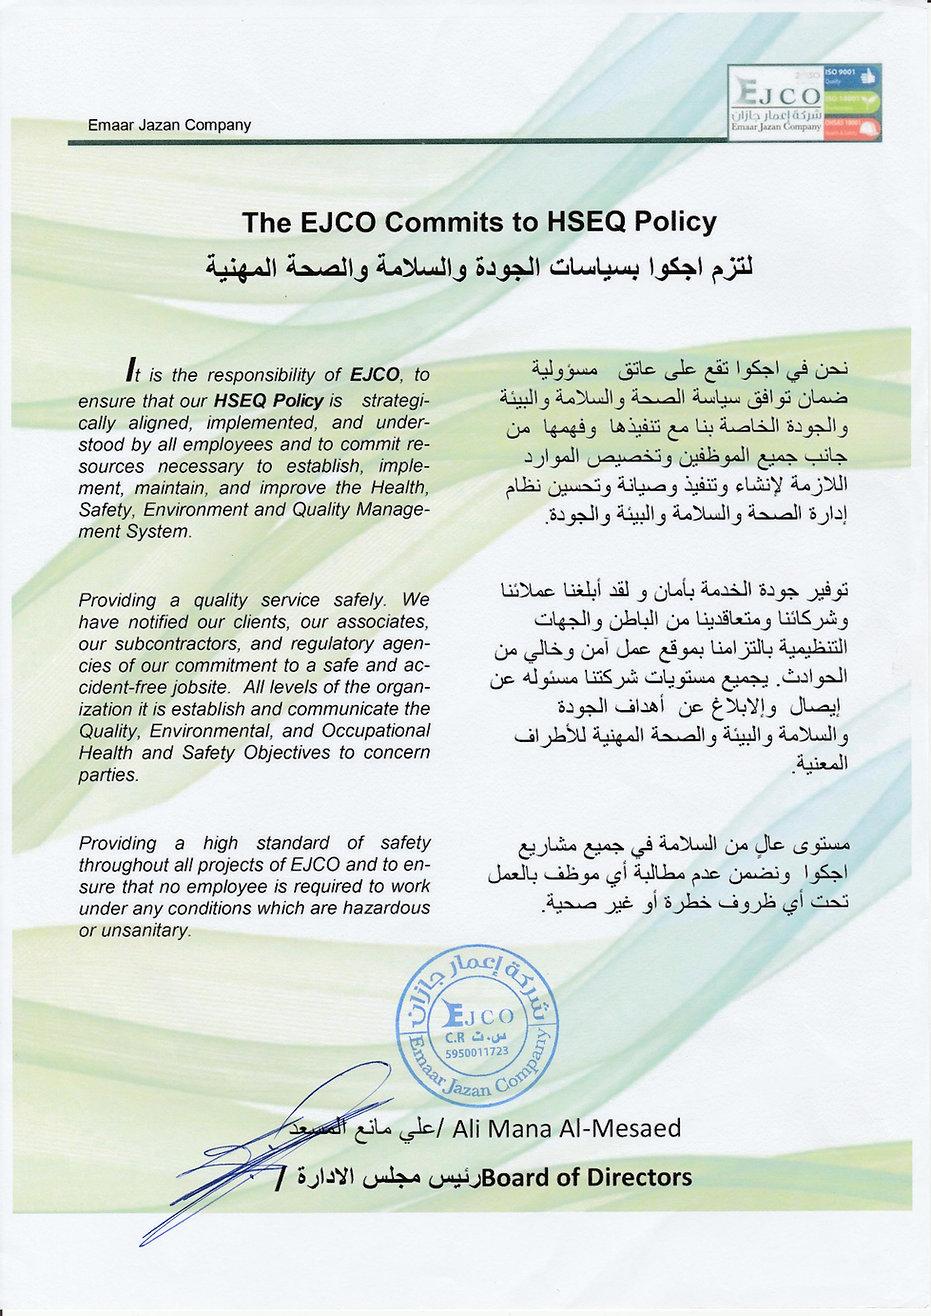 EJCO HSEQ POLICY.jpg